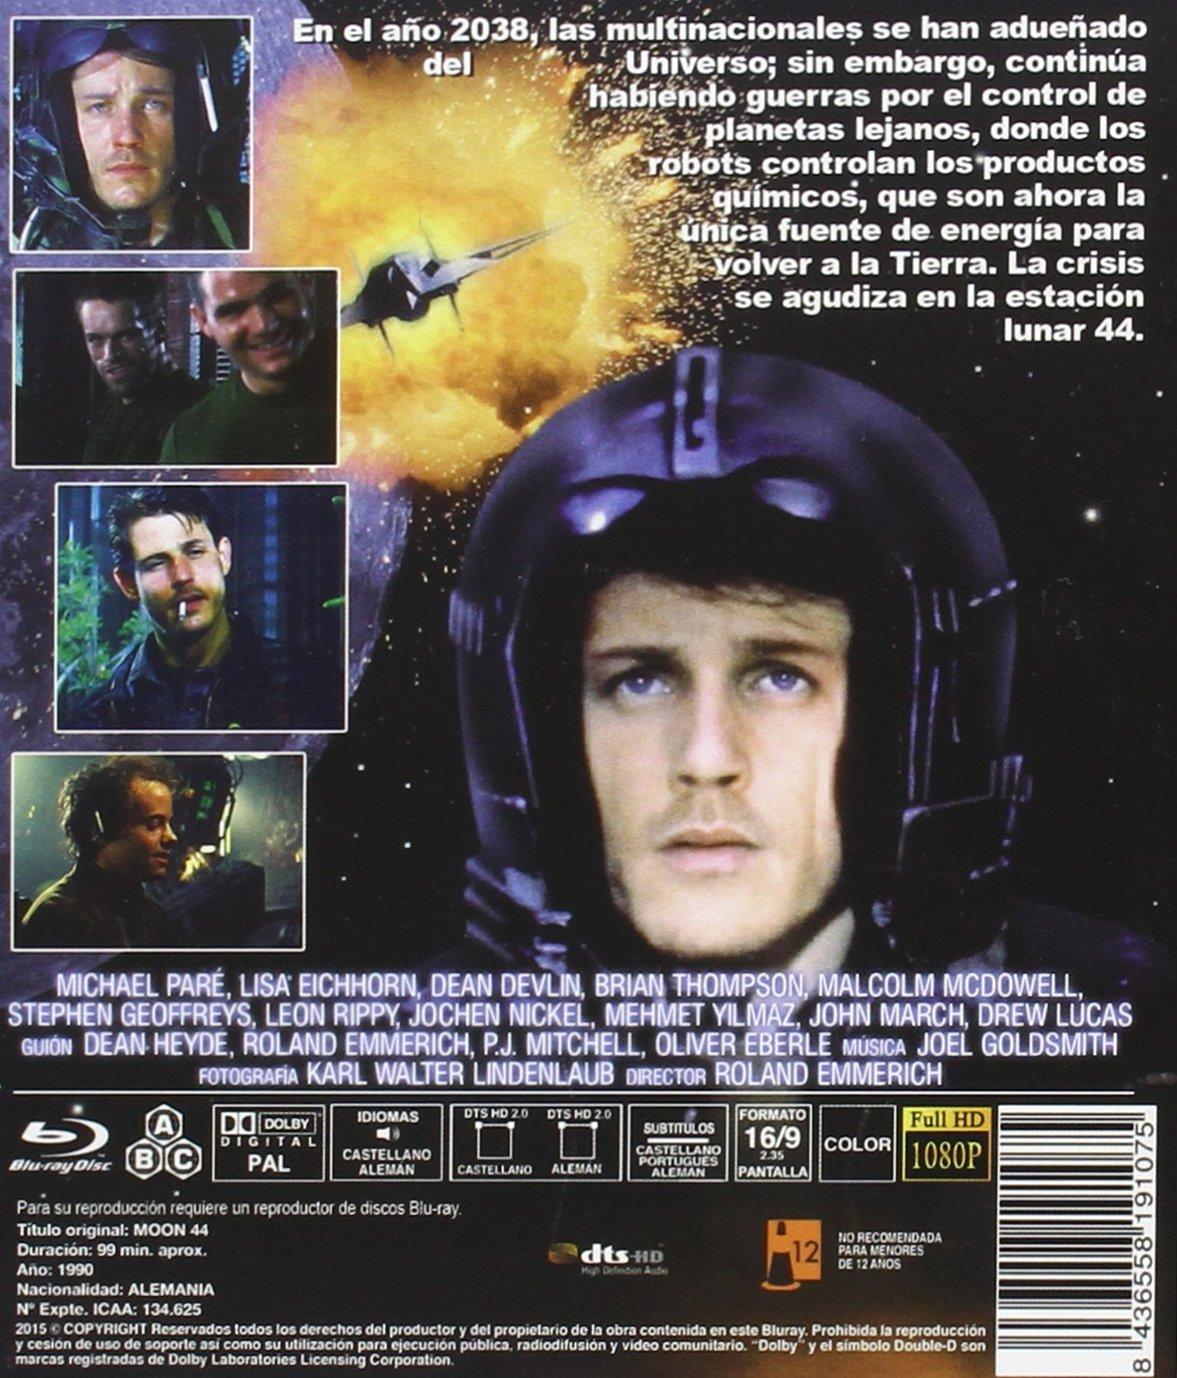 Amazon.com: Moon 44 (Region B) [ Non-usa Format, Import - Spain ]: Movies & TV